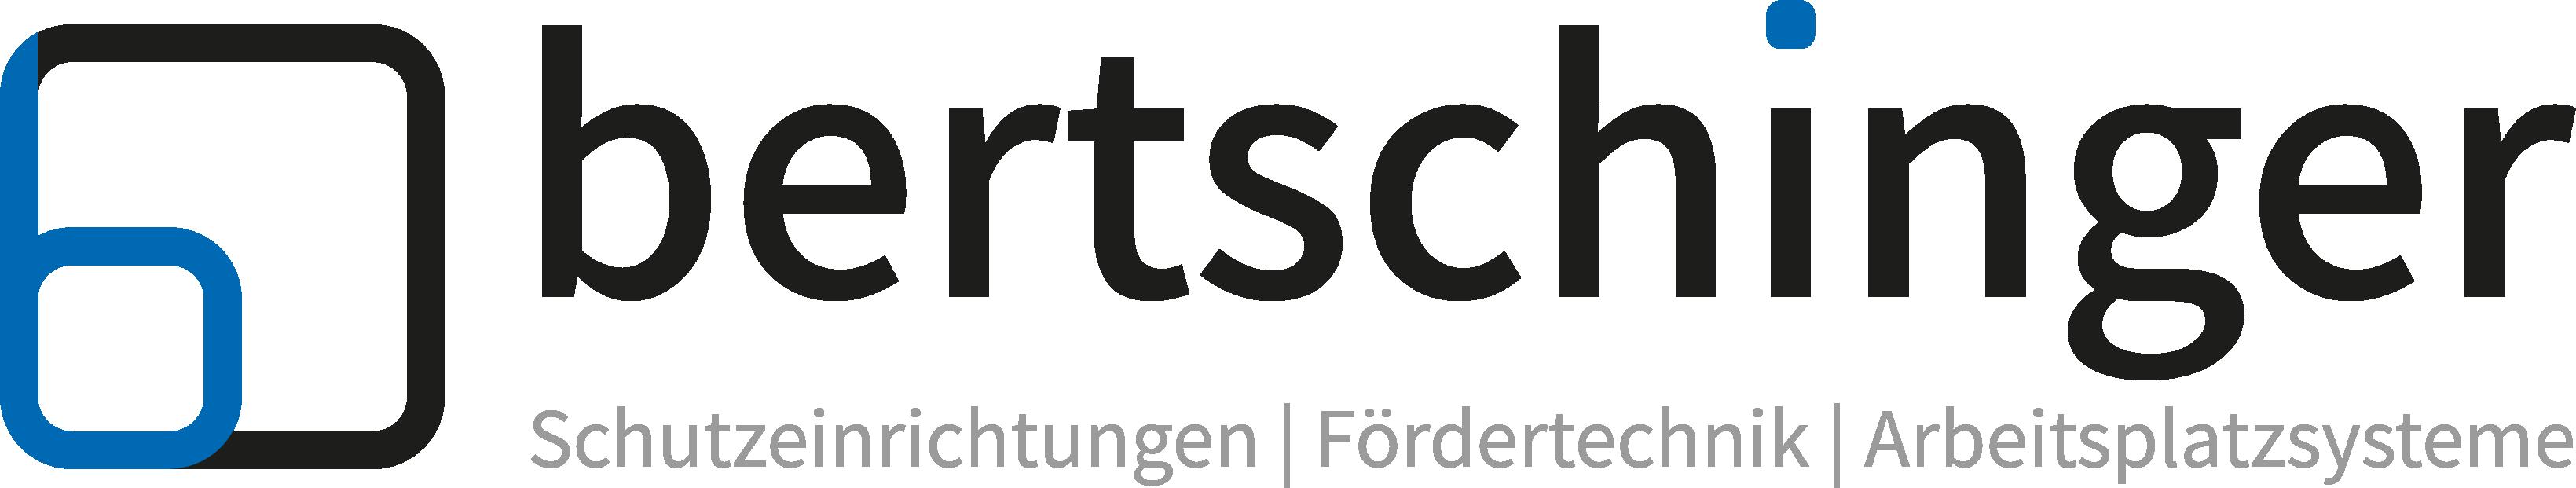 Bertschinger GmbH & Co. KG - Logo